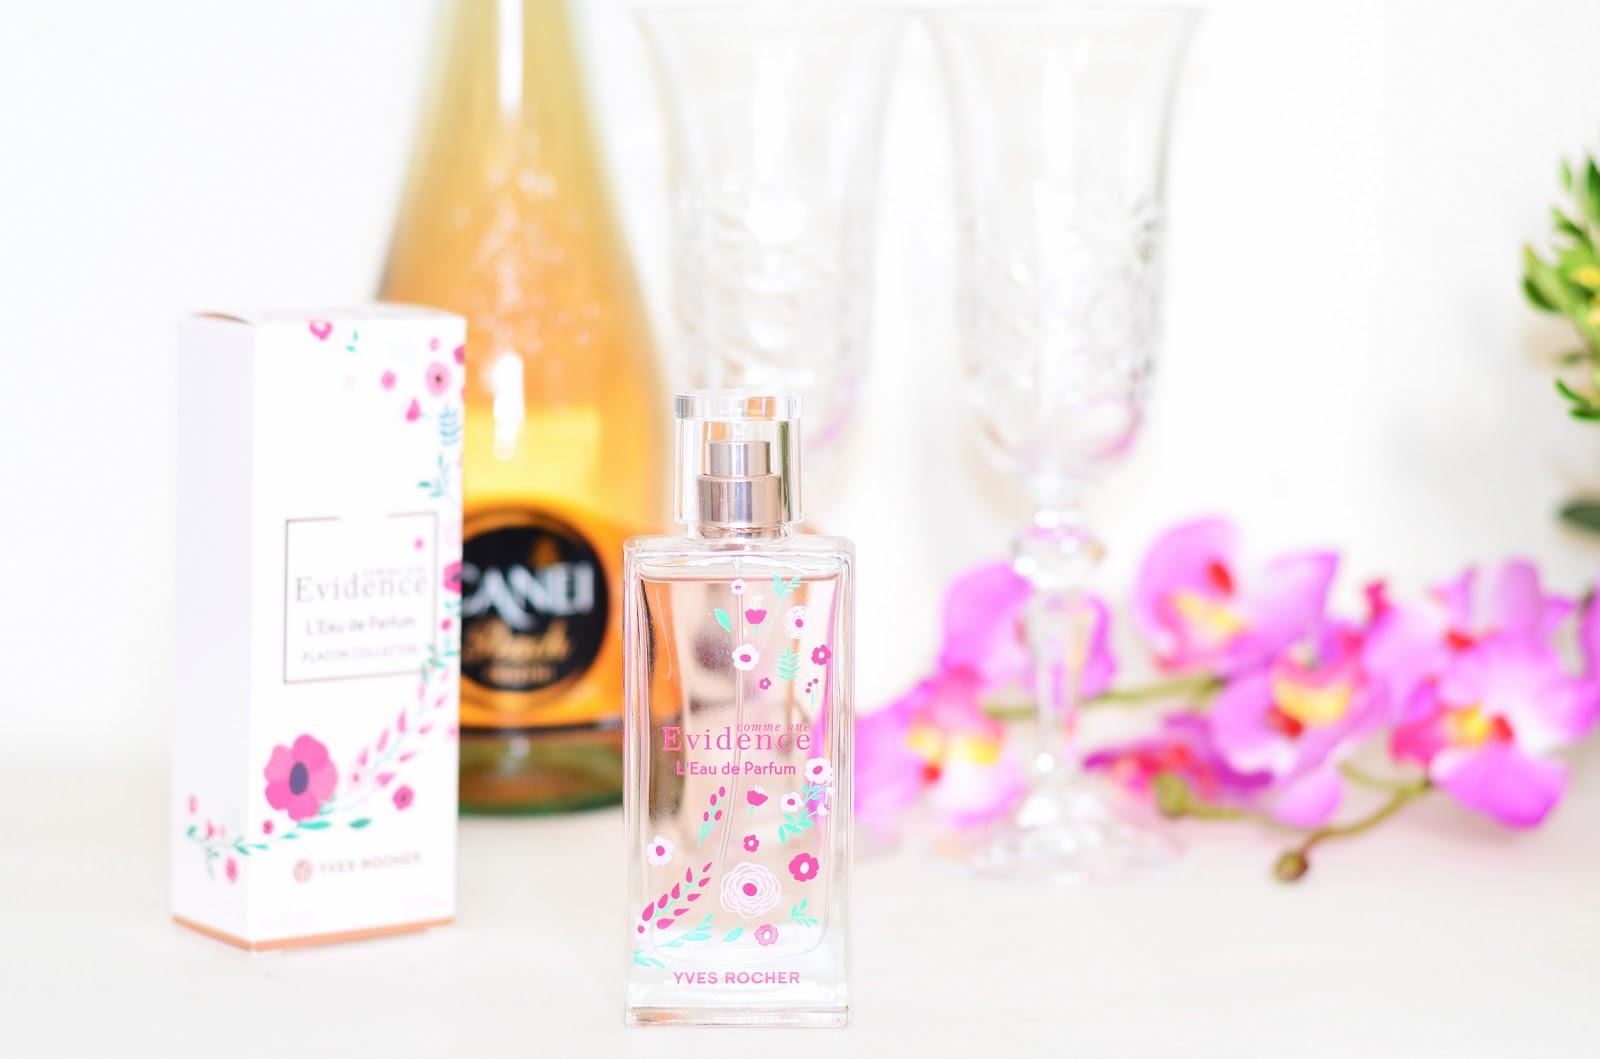 Rysichka Yves Rocher Comme Une Evidence Leau De Parfum парфюмерная